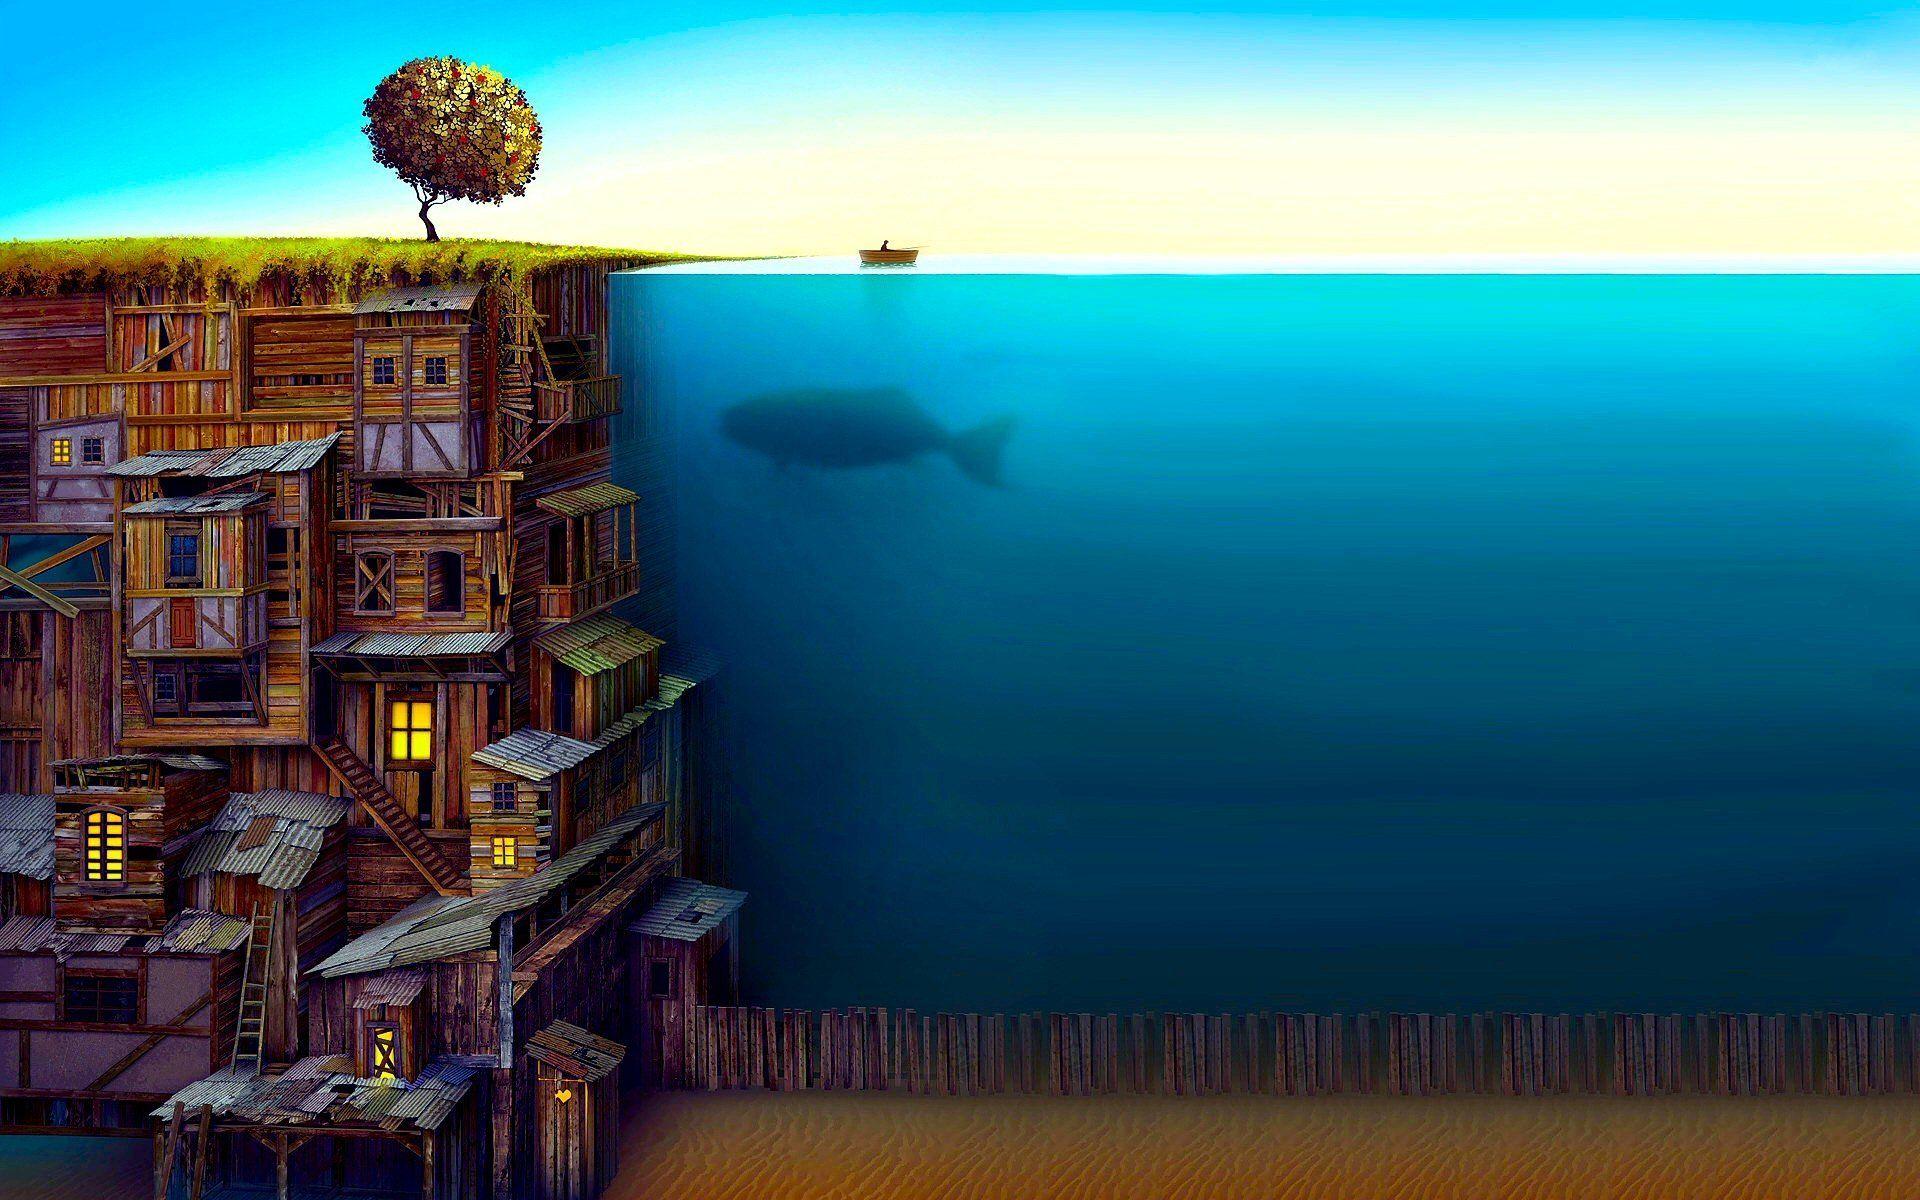 underwater background images hd